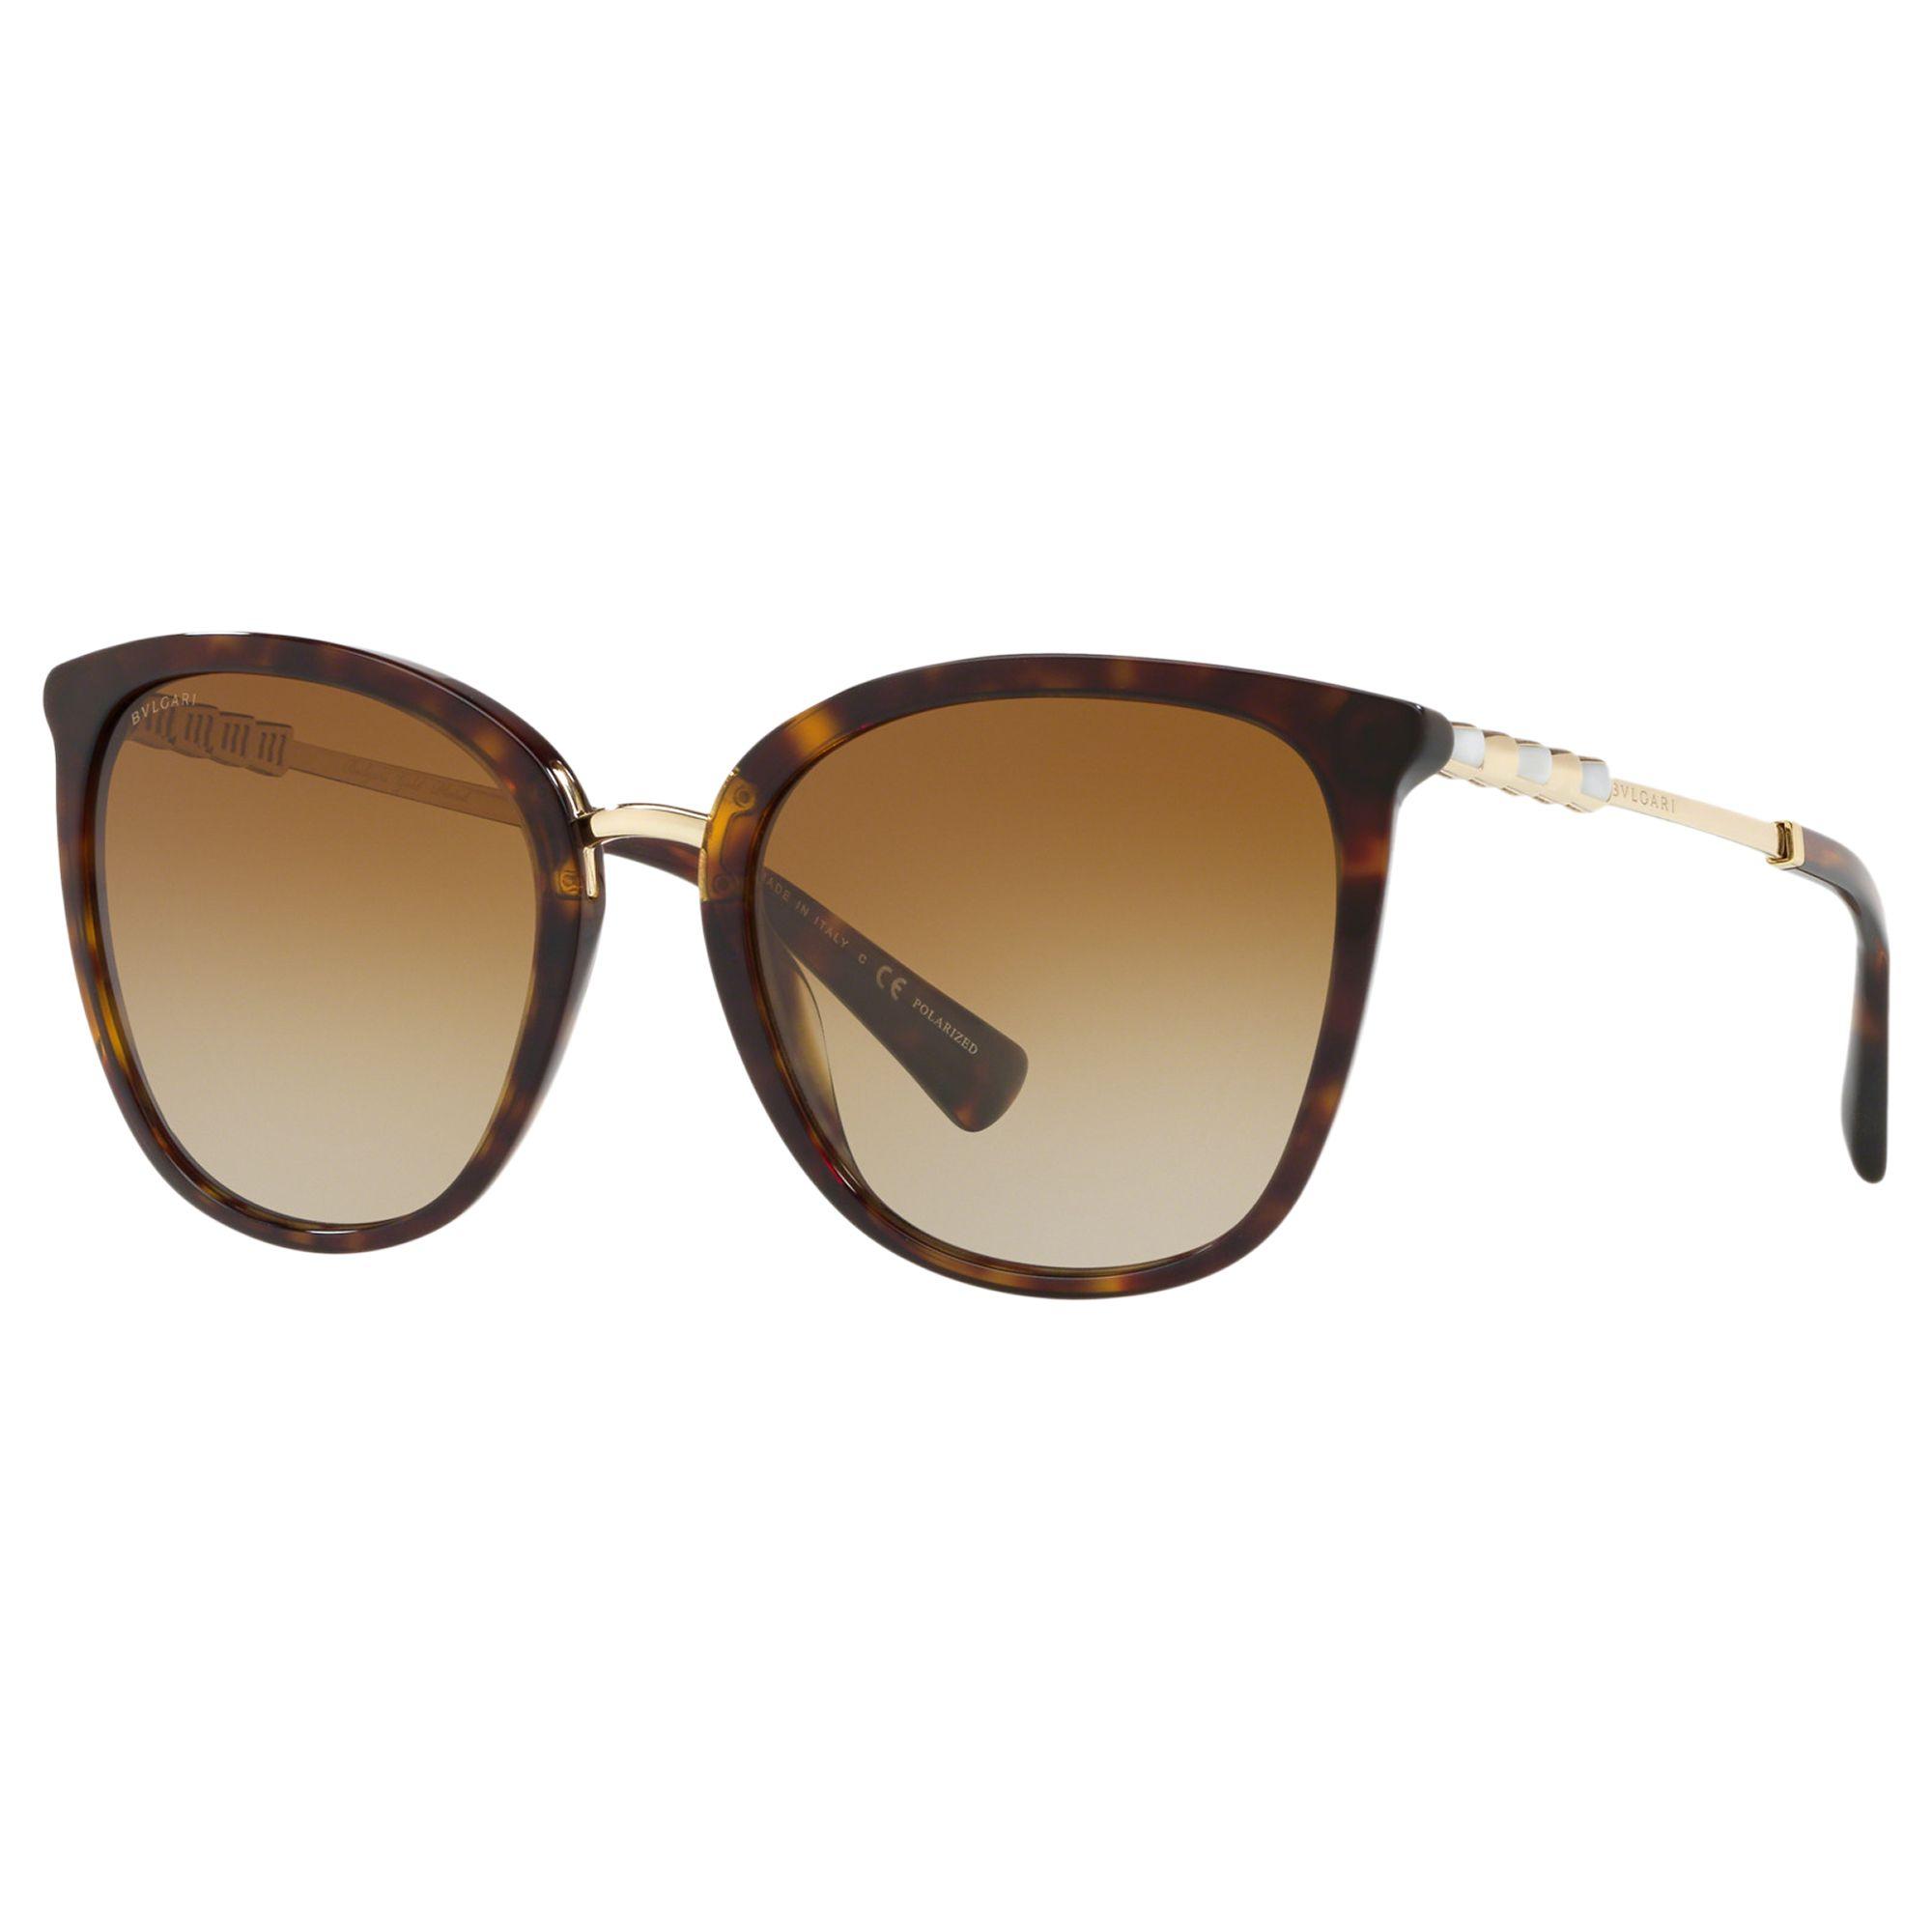 Bvlgari BVLGARI BV8205KB Women's Polarised Oval Sunglasses, Tortoise/Brown Gradient